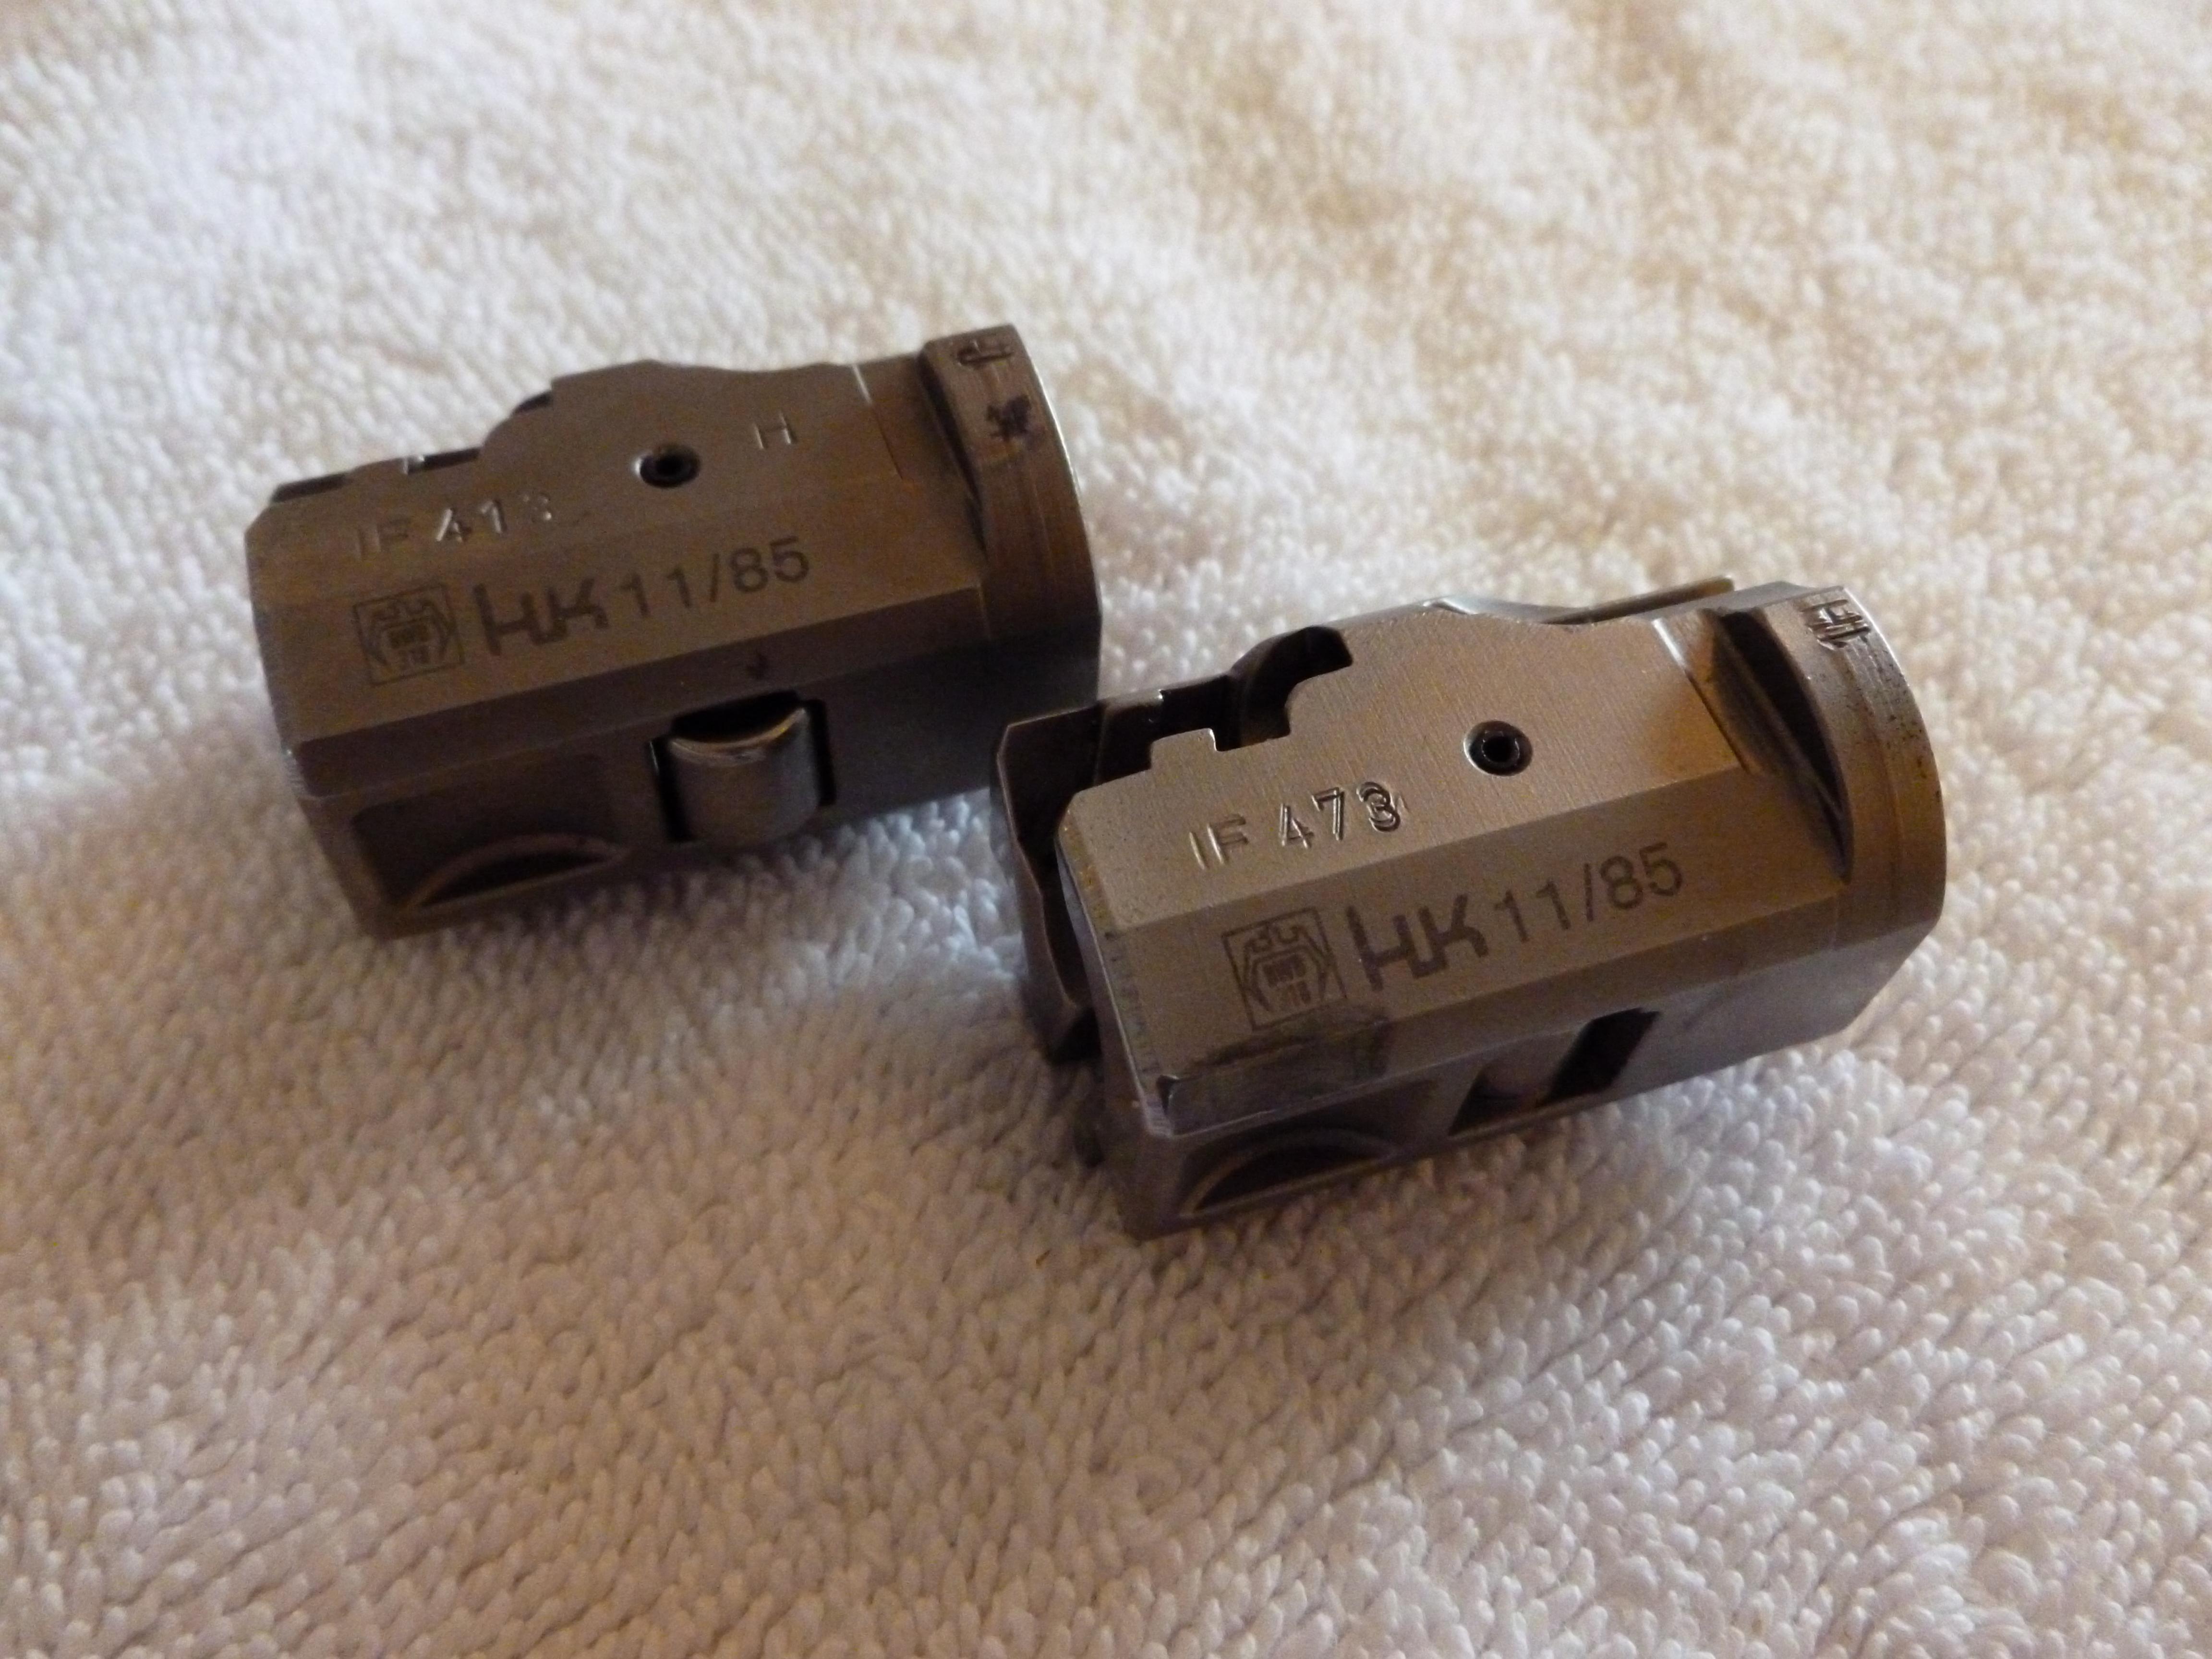 WTS: PRICE REDUCTION - Original HK MP5 9mm Bolt Head Assembles - USED-p1030443.jpg